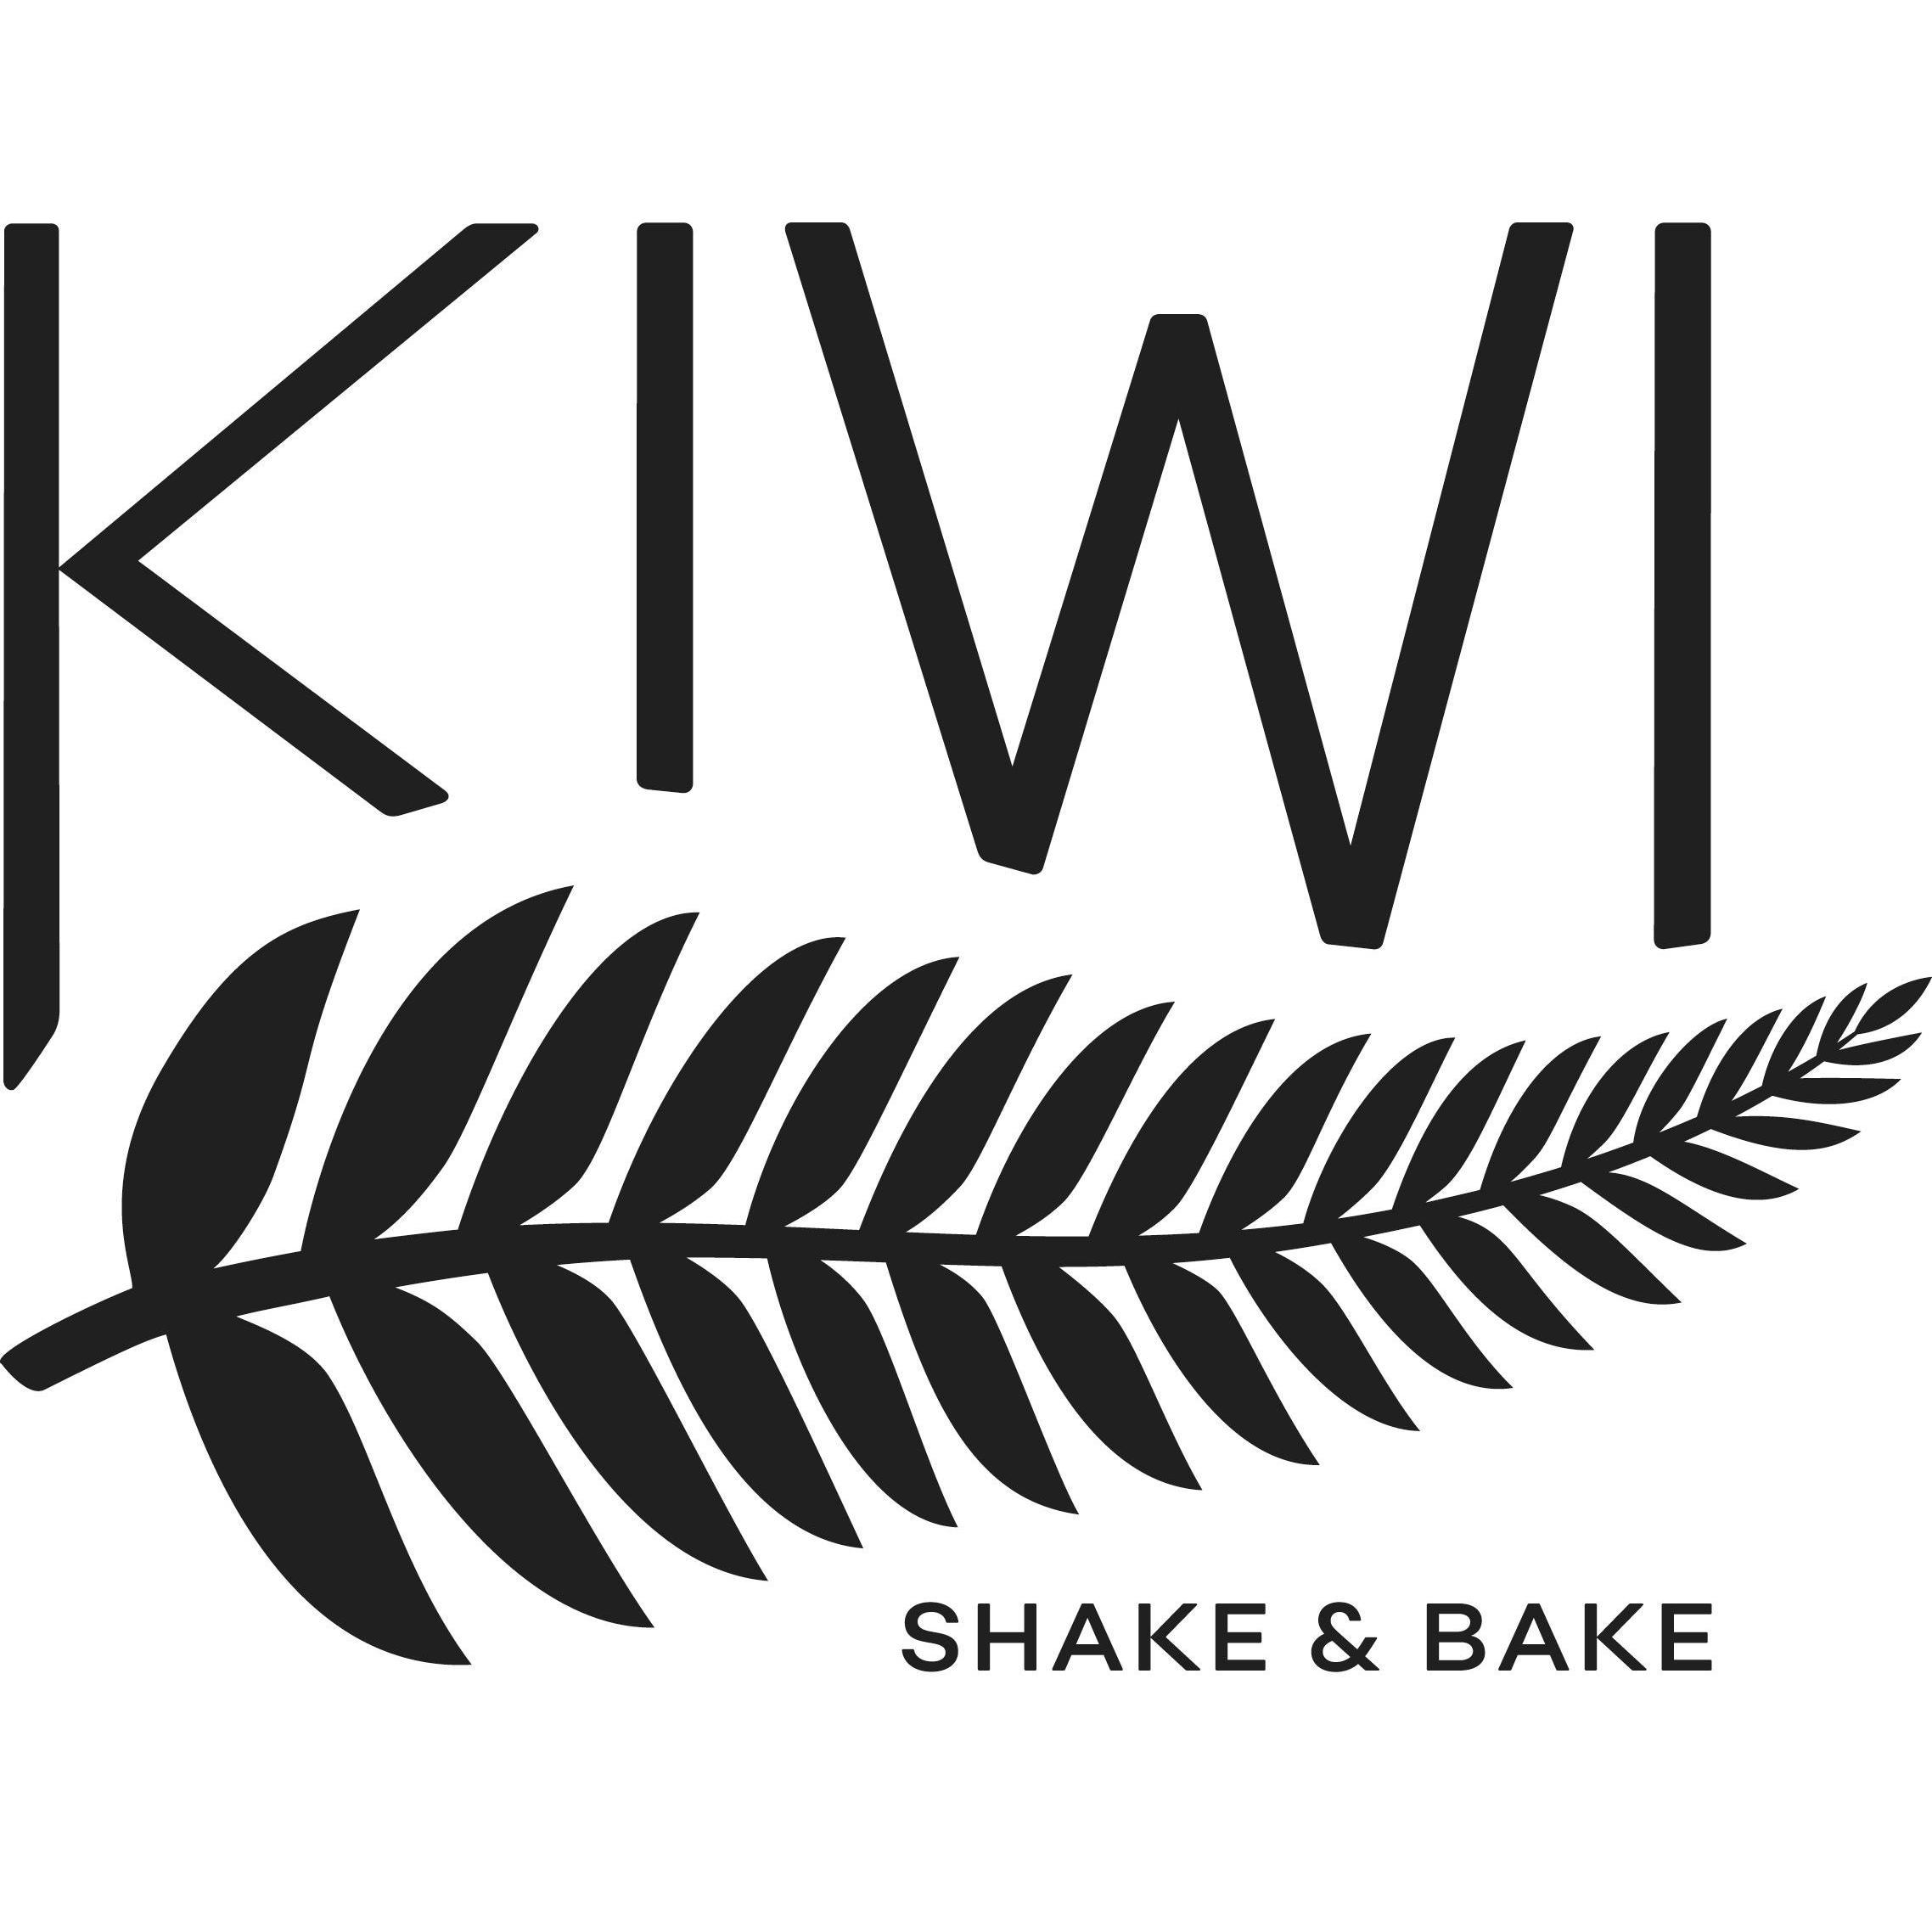 Kiwi Shake and Bake